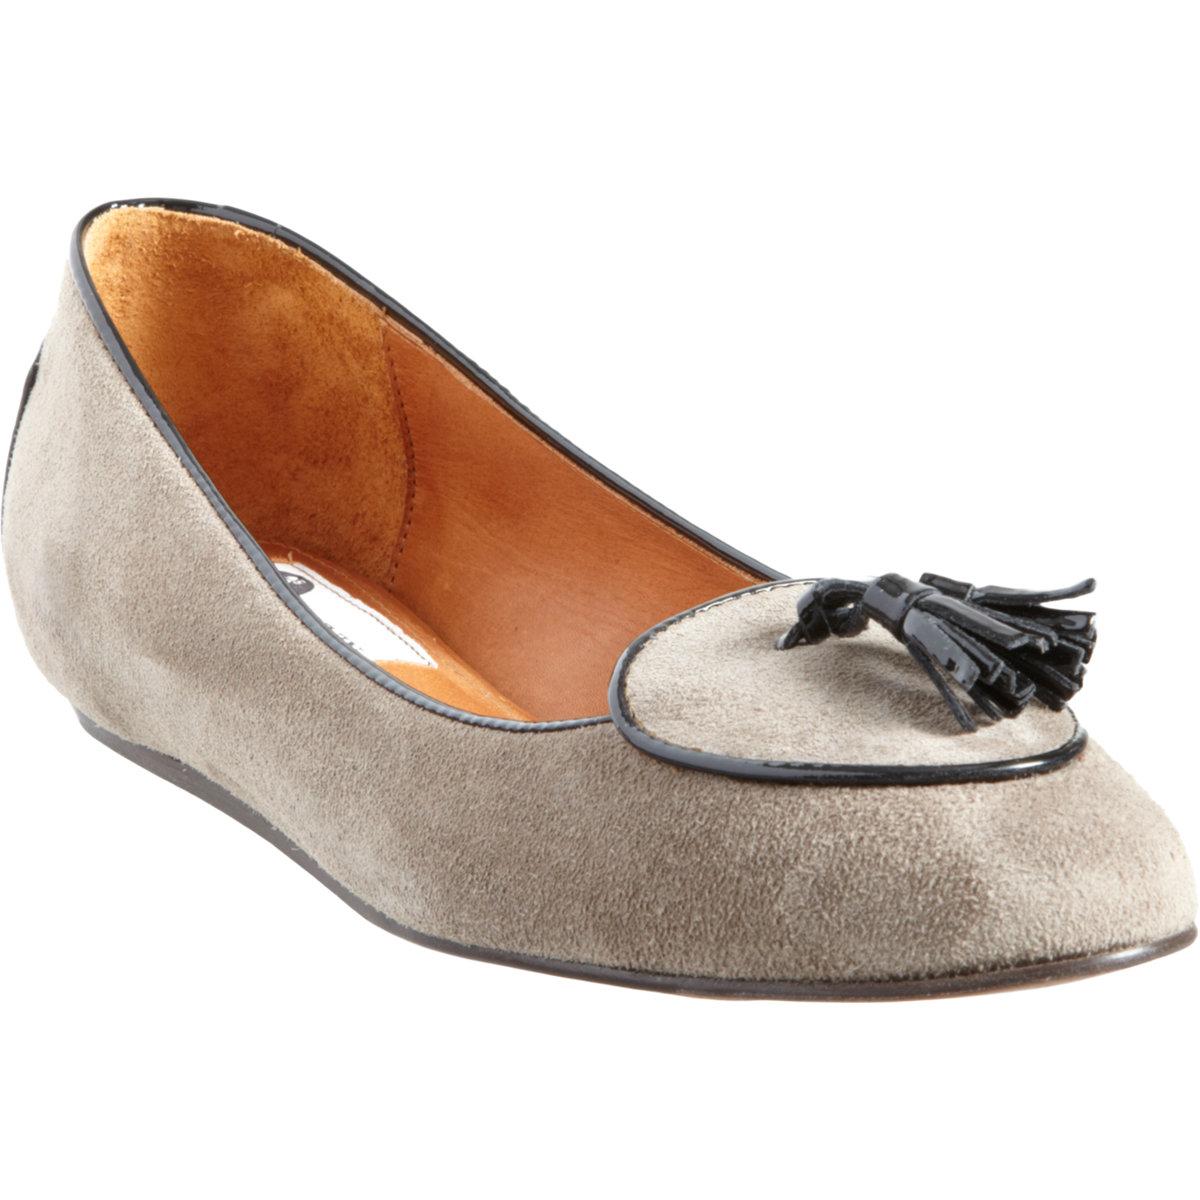 Belgian Shoes New York